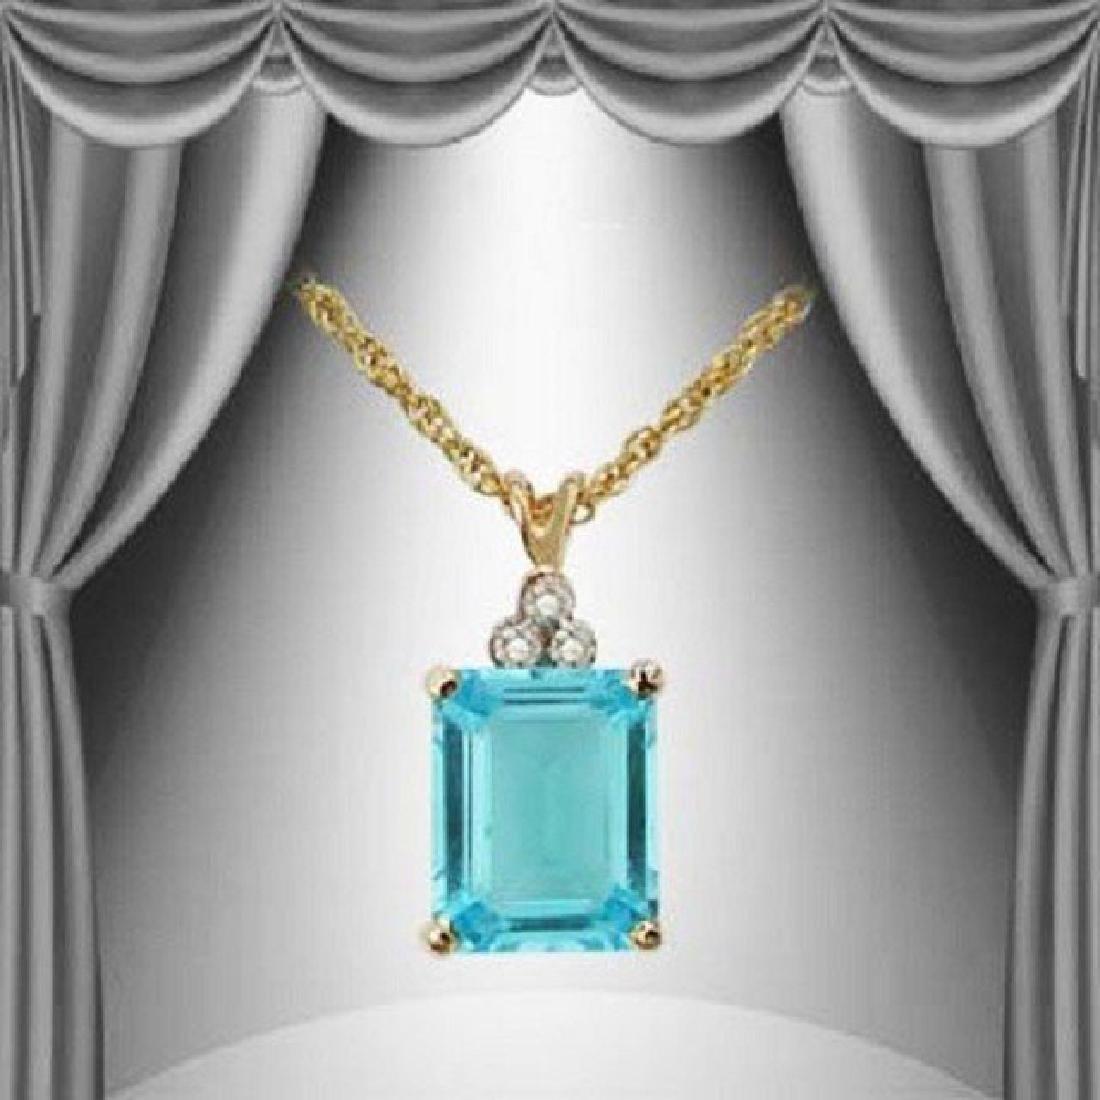 4.71 CT Blue Topaz & Diamond Fine Necklace $845